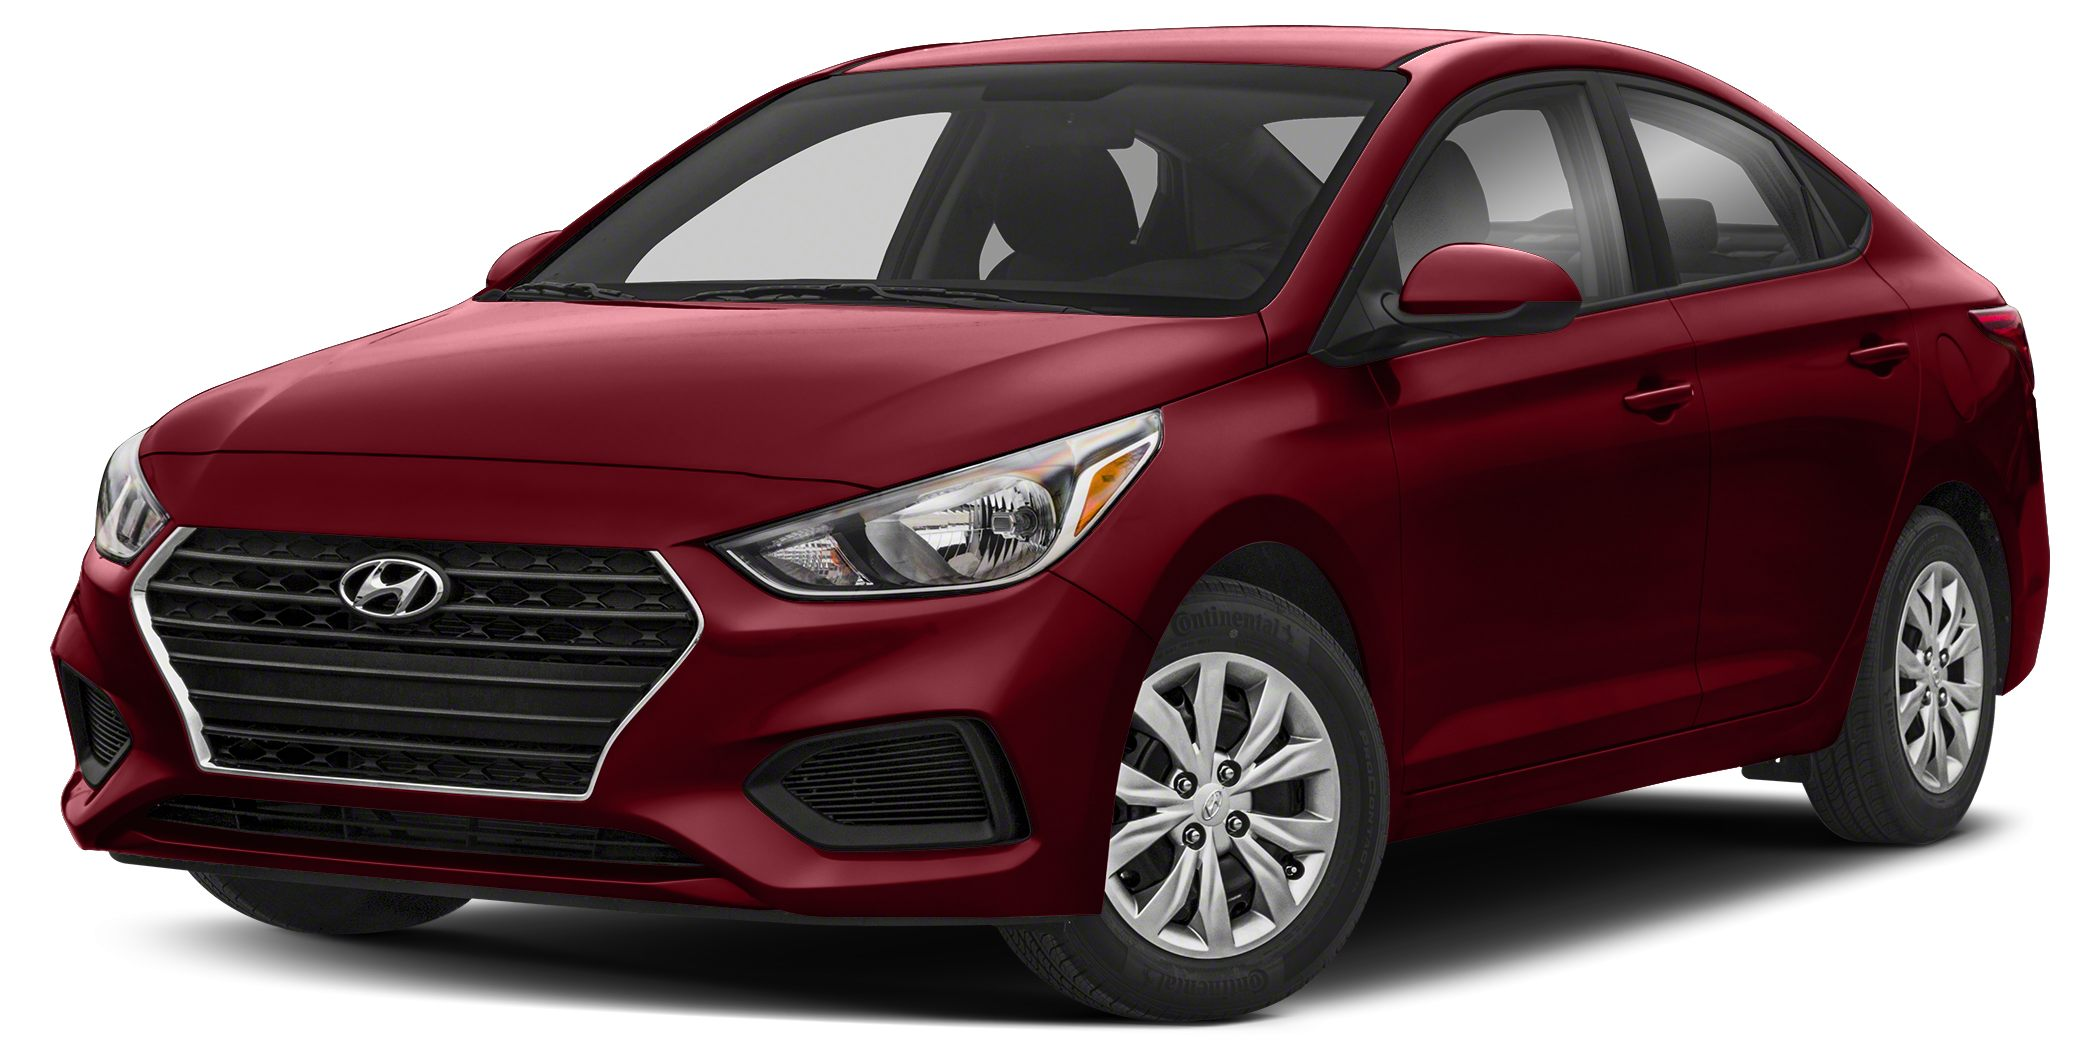 2018 Hyundai Accent SE SE trim iPodMP3 Input Back-Up Camera CD Player Bluetooth EPA 38 MPG H